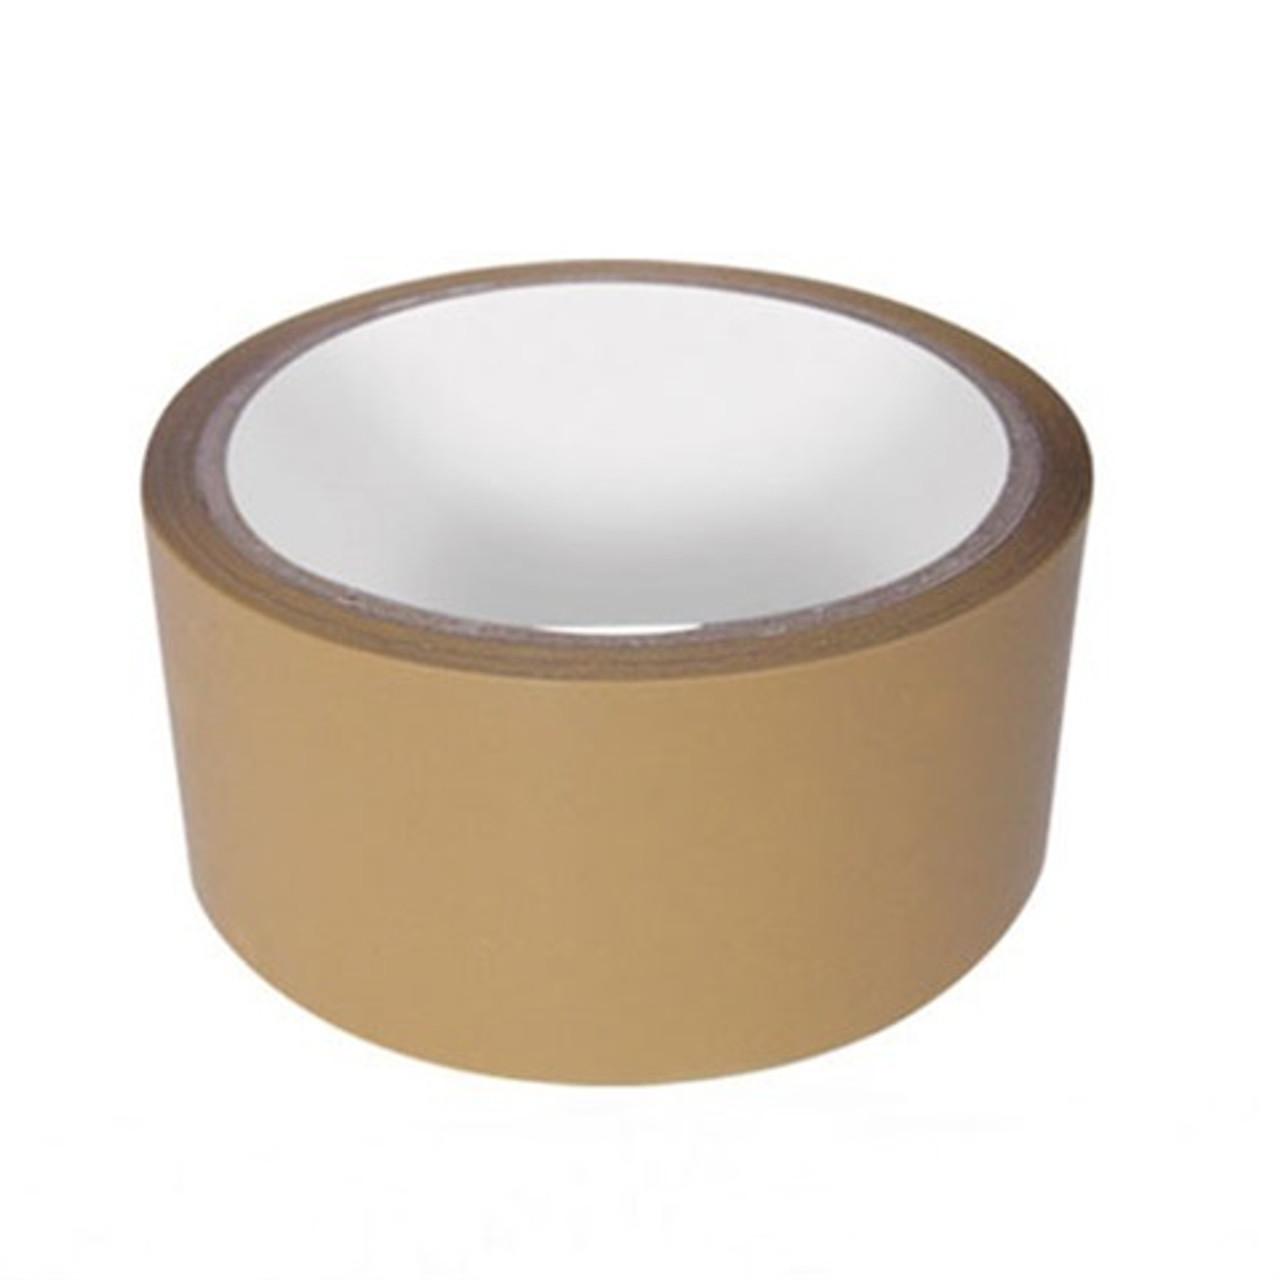 "Hot Melt Acrylic Box Shipping Tapes 2/"" x 110 Yds 36 1.6 Mil 36 Rolls"